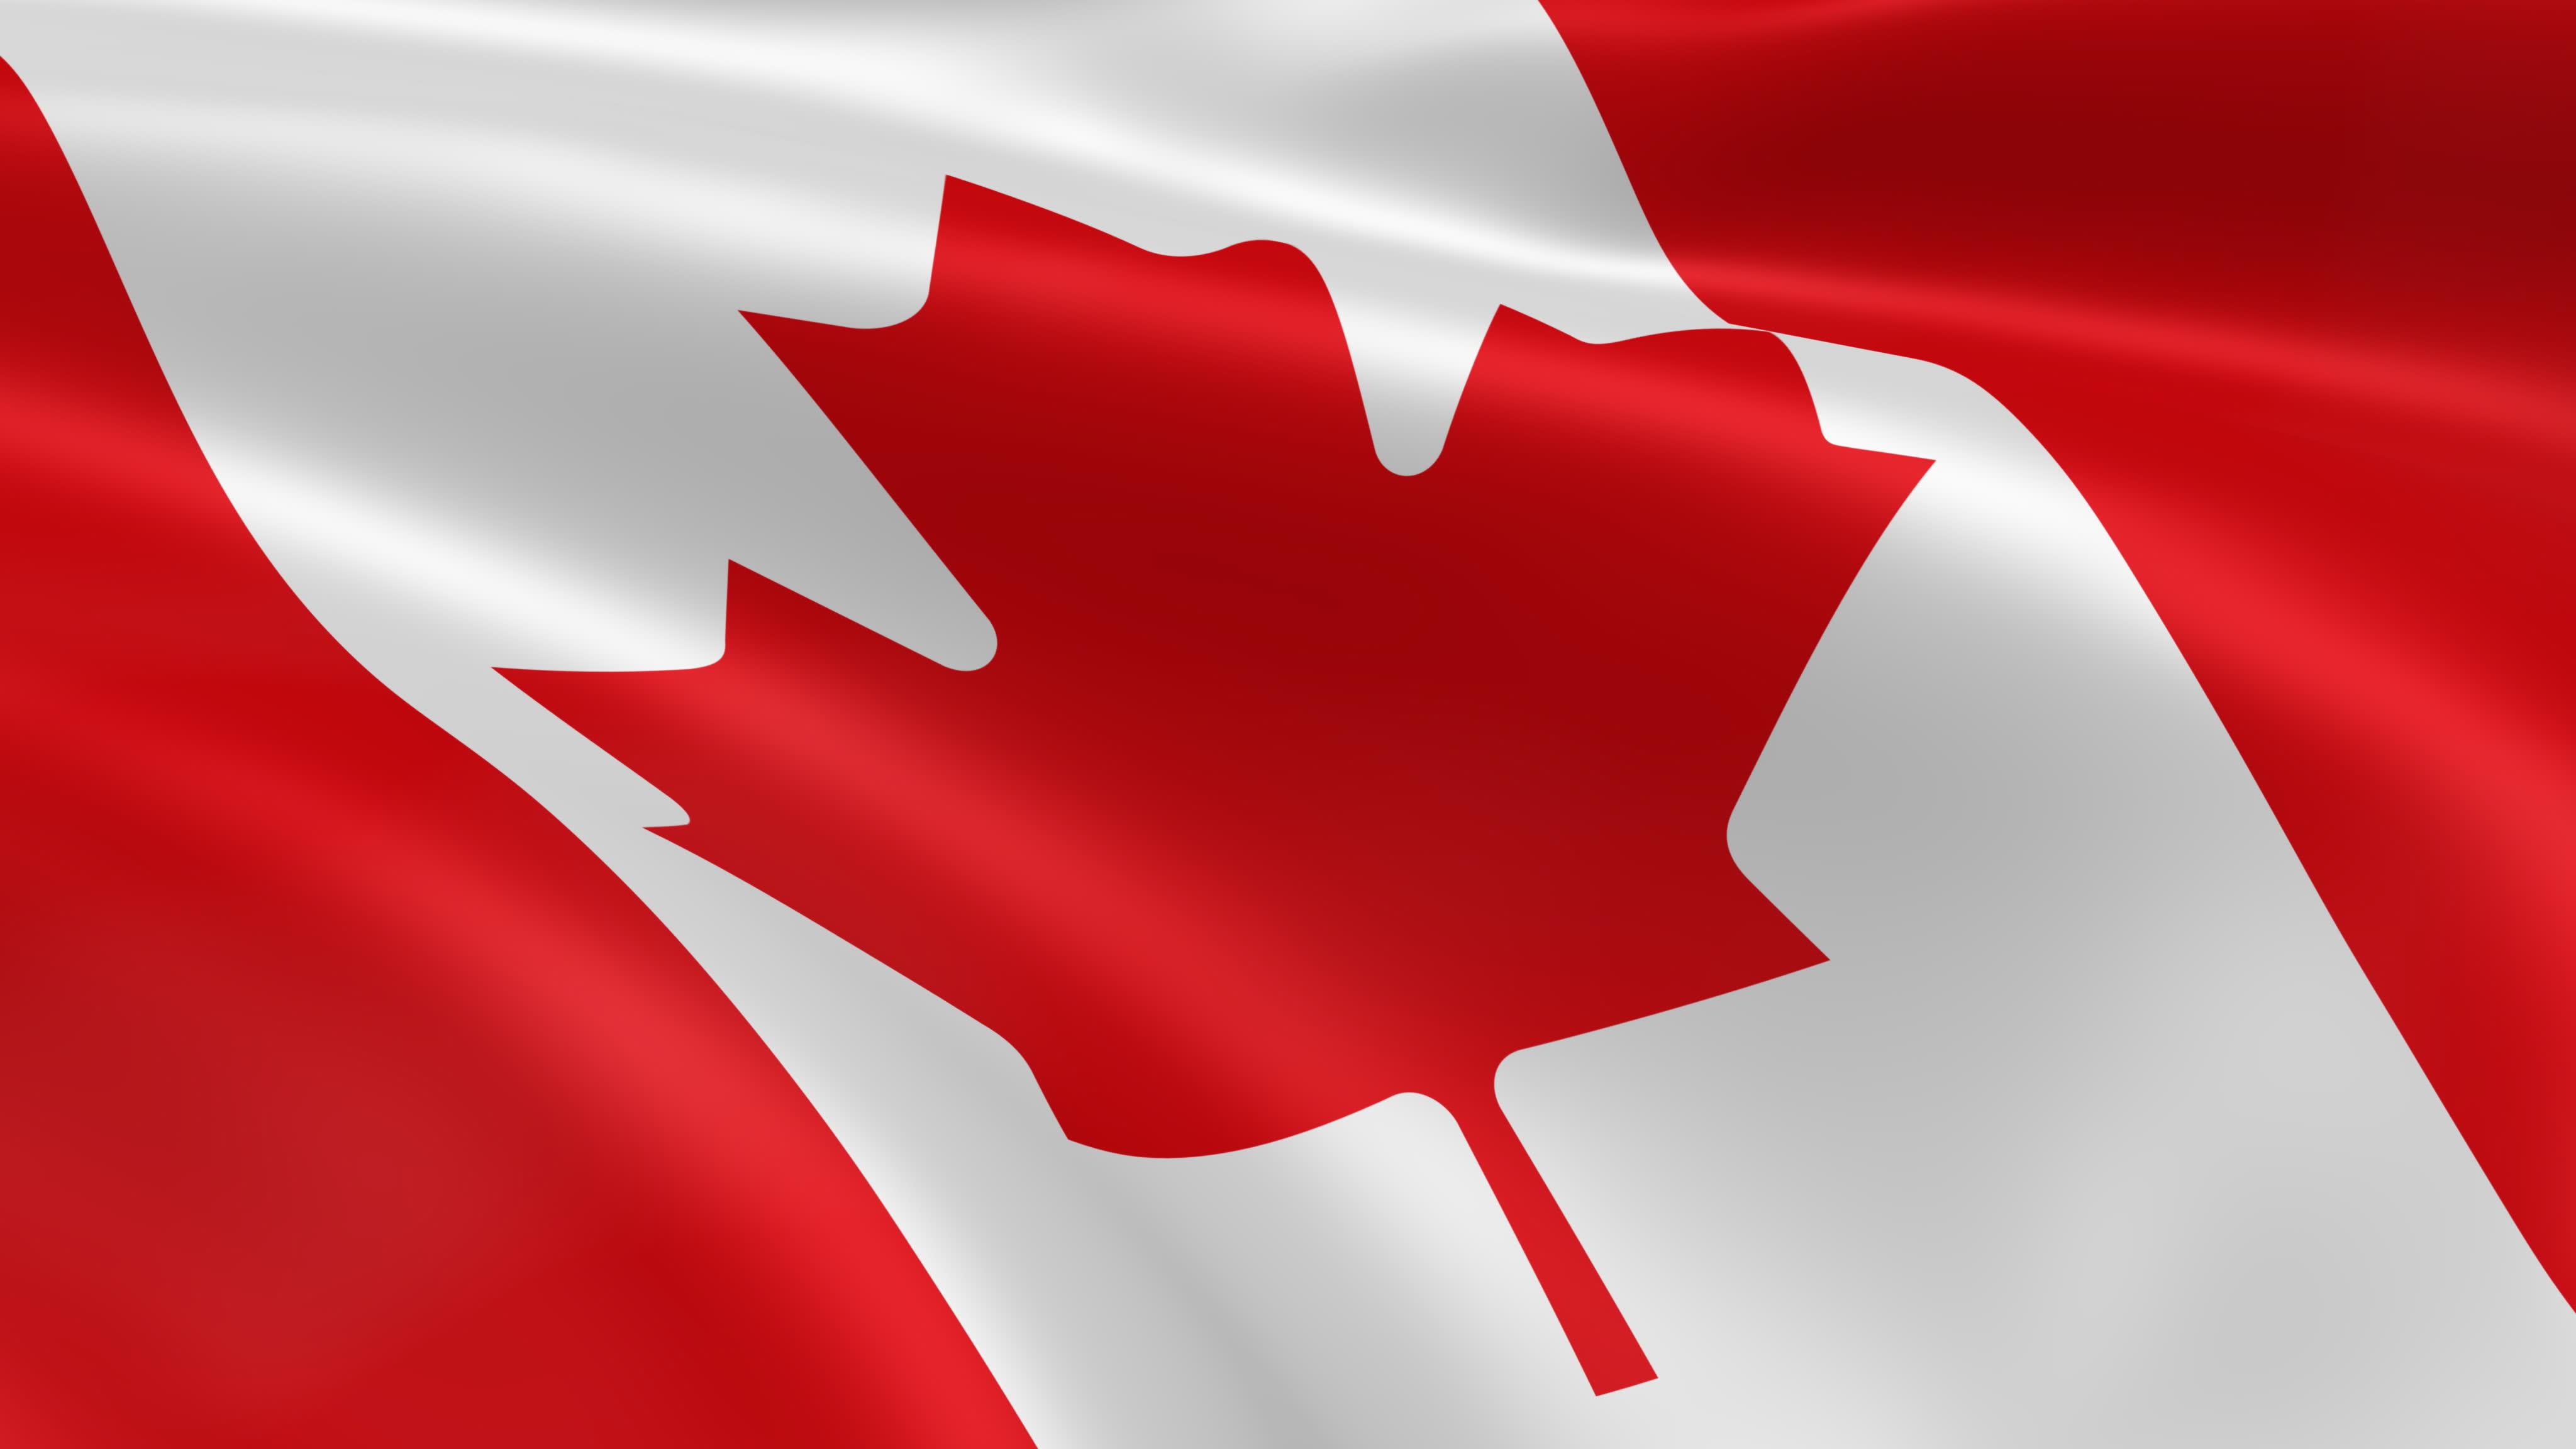 Animated Diwali Diya Wallpapers Canada Day Flags Whatsapp Dp Facebook Google Plus Twitter